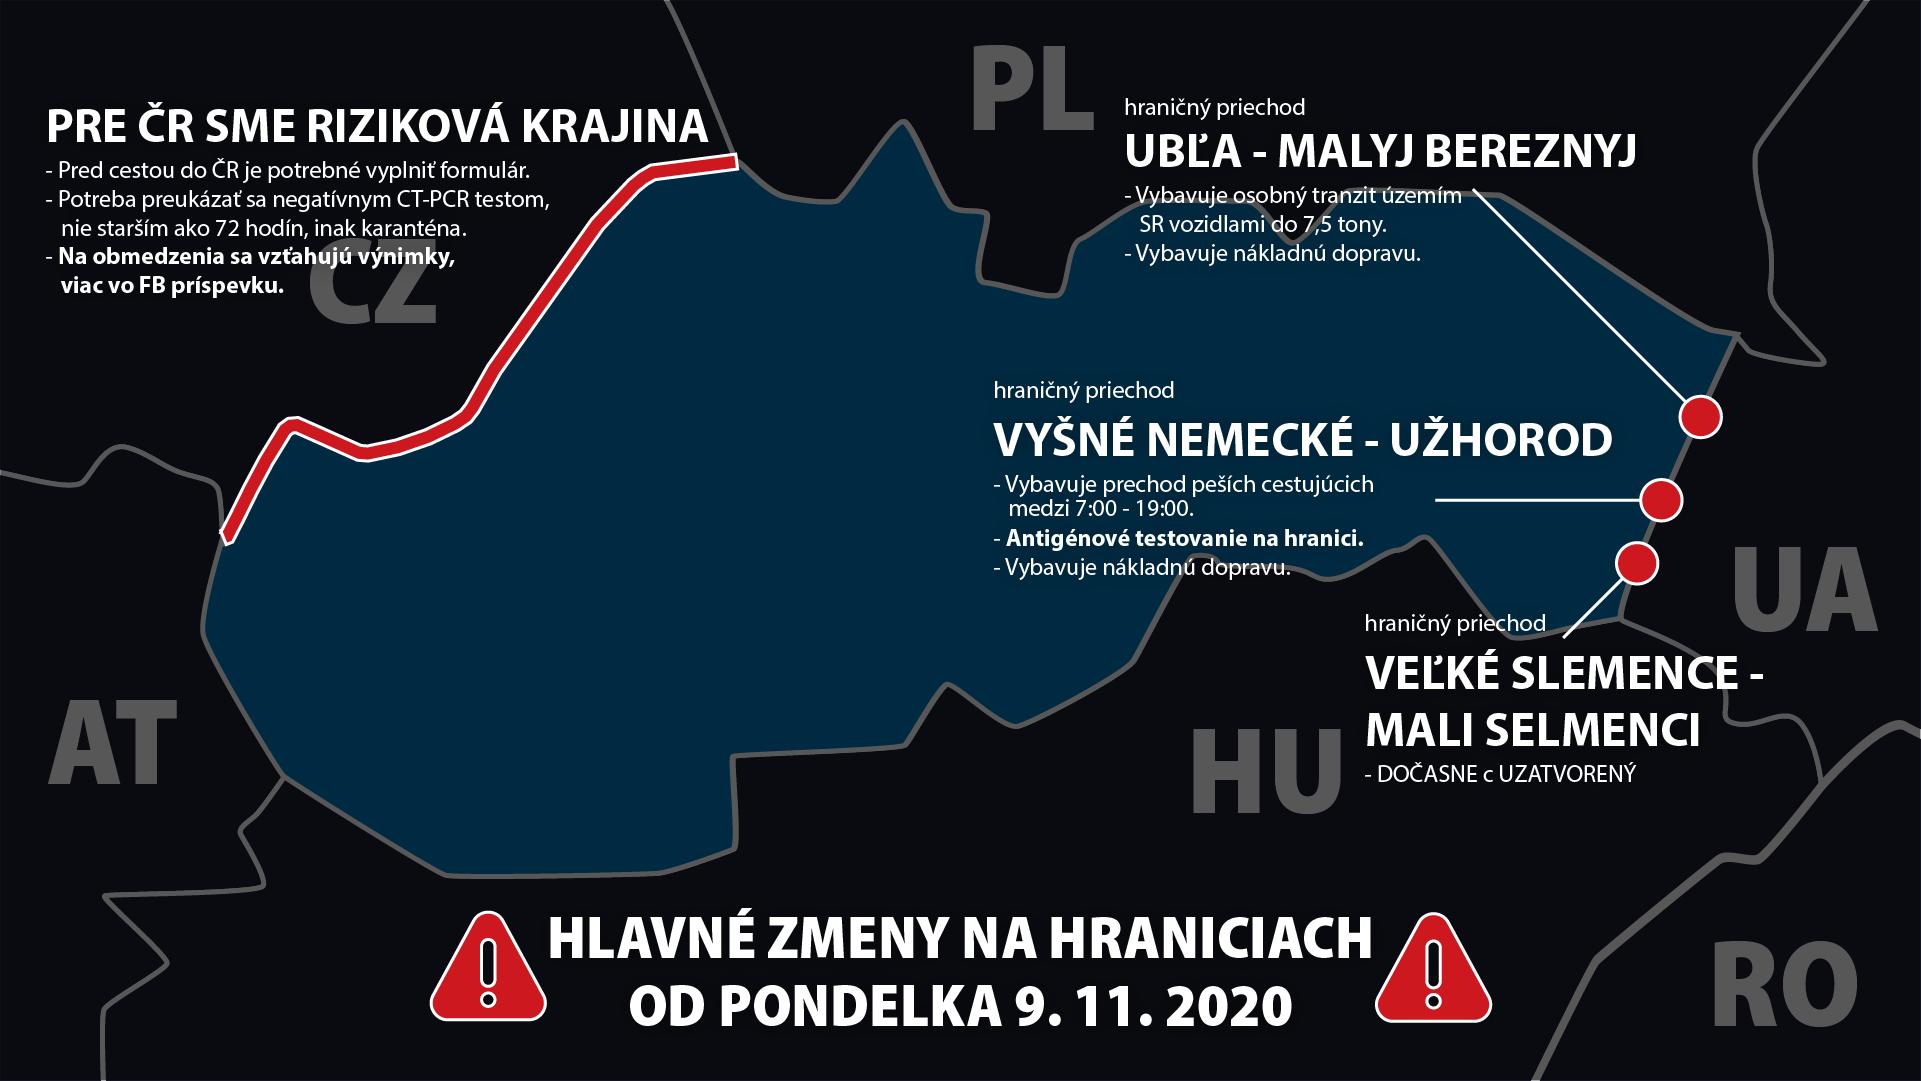 martin-klus-ua-cz-zmeny-na-hraniciach